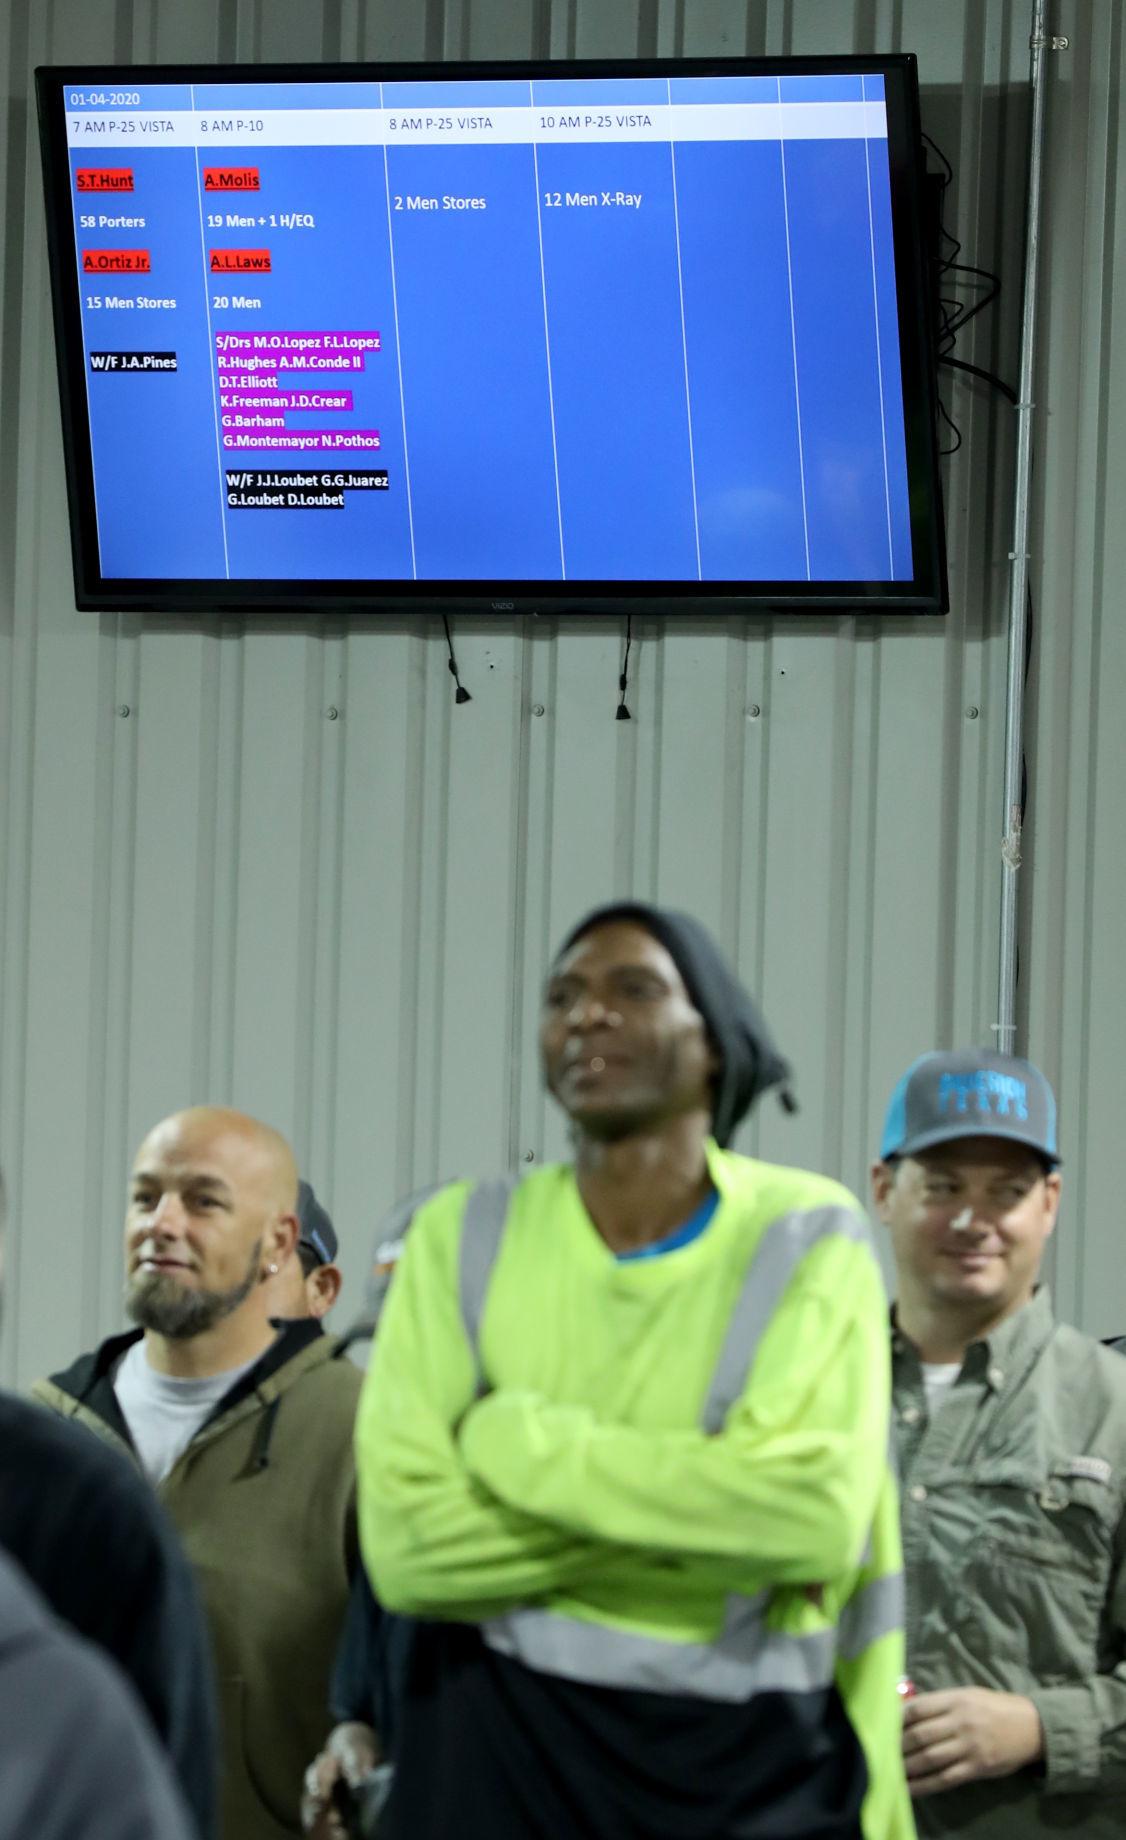 Cruise, cargo shuffling raises labor concerns